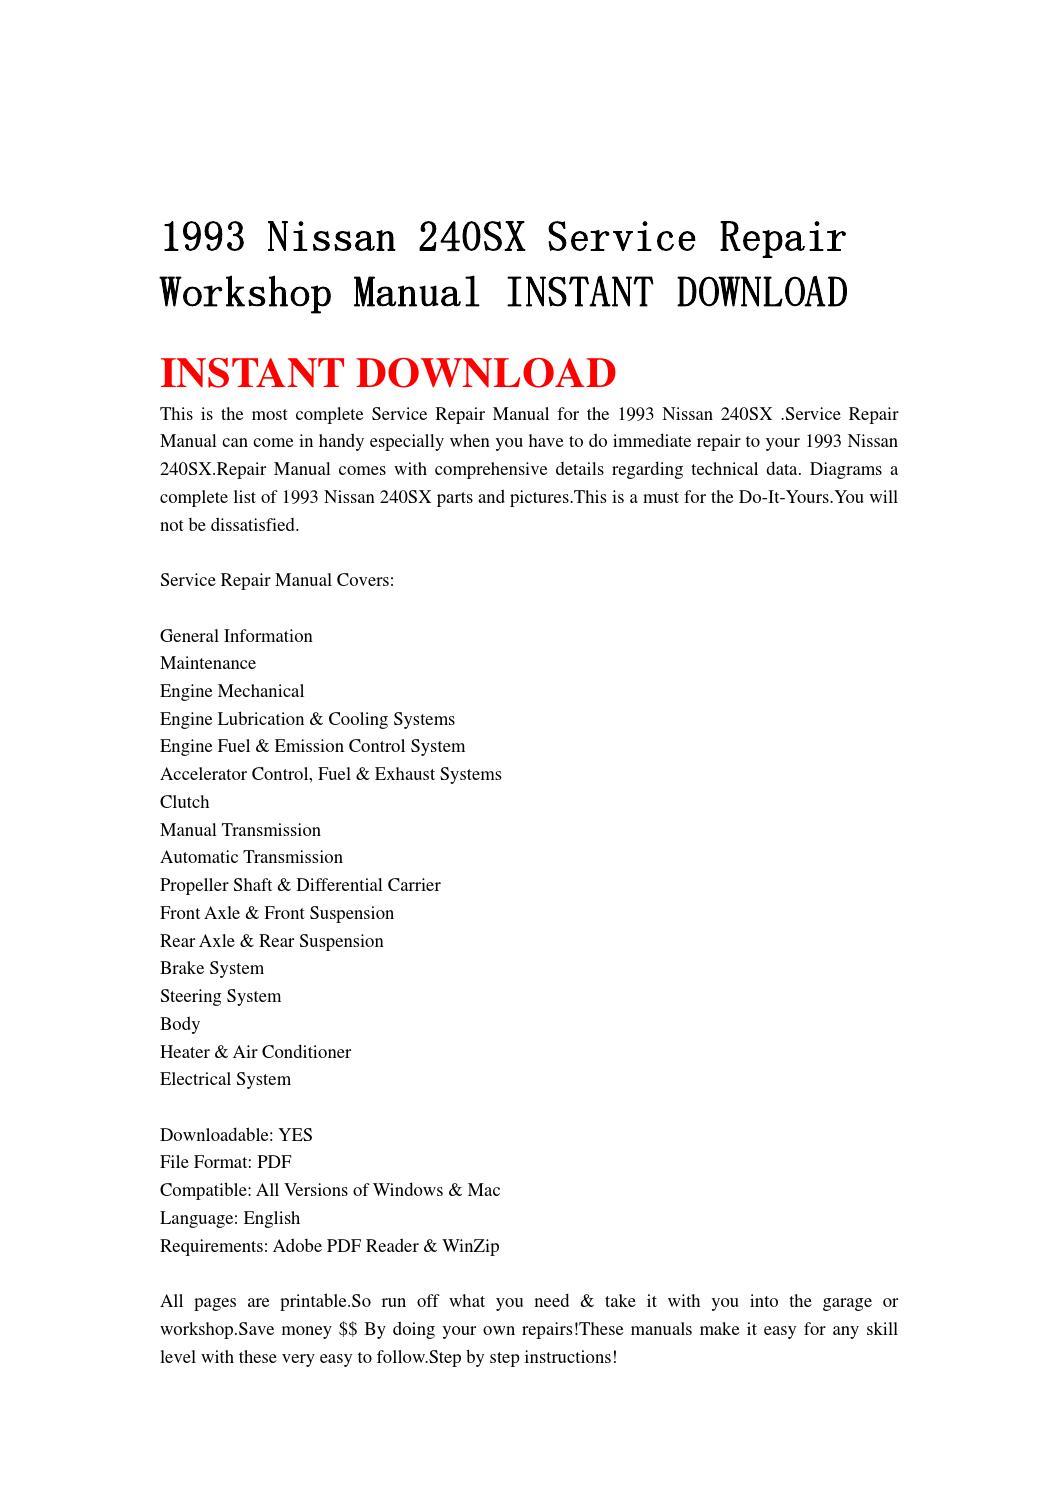 1993 Nissan 240sx Service Repair Workshop Manual Instant Download By 93 Engine Diagram Djhsenfnn Issuu